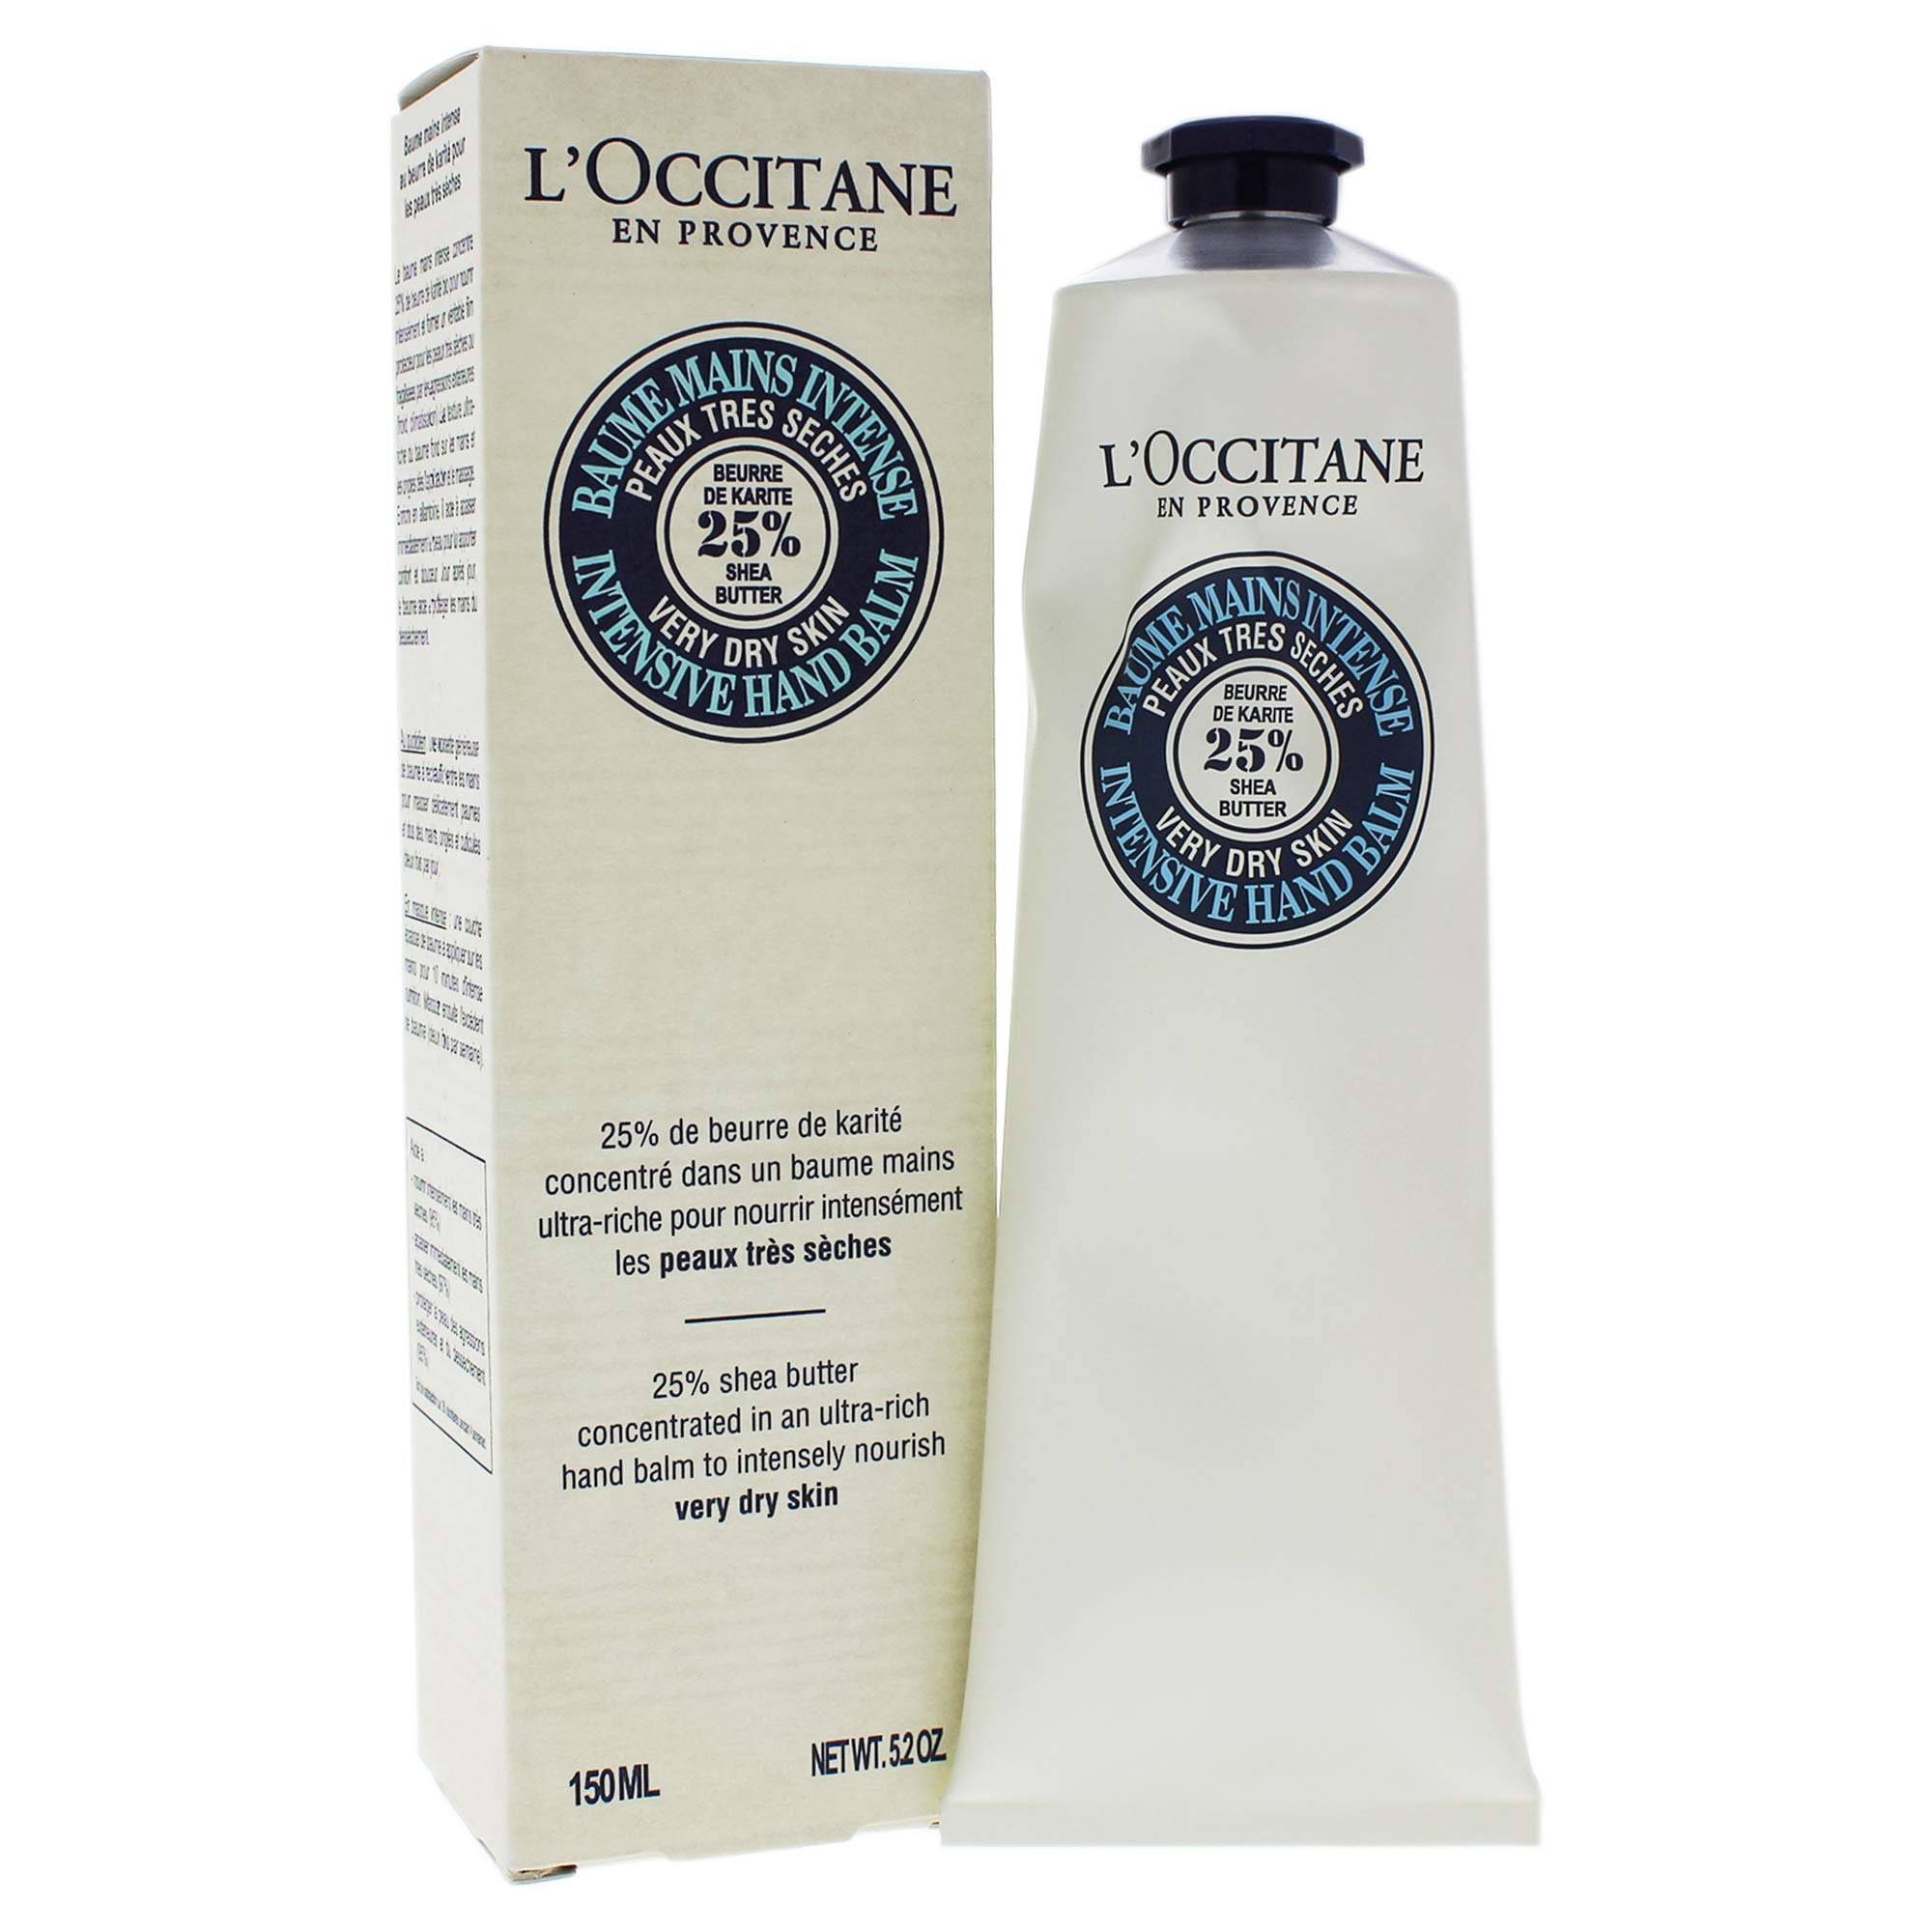 Bálsamo de manos intenso karité – 150 ml – l'occitane.